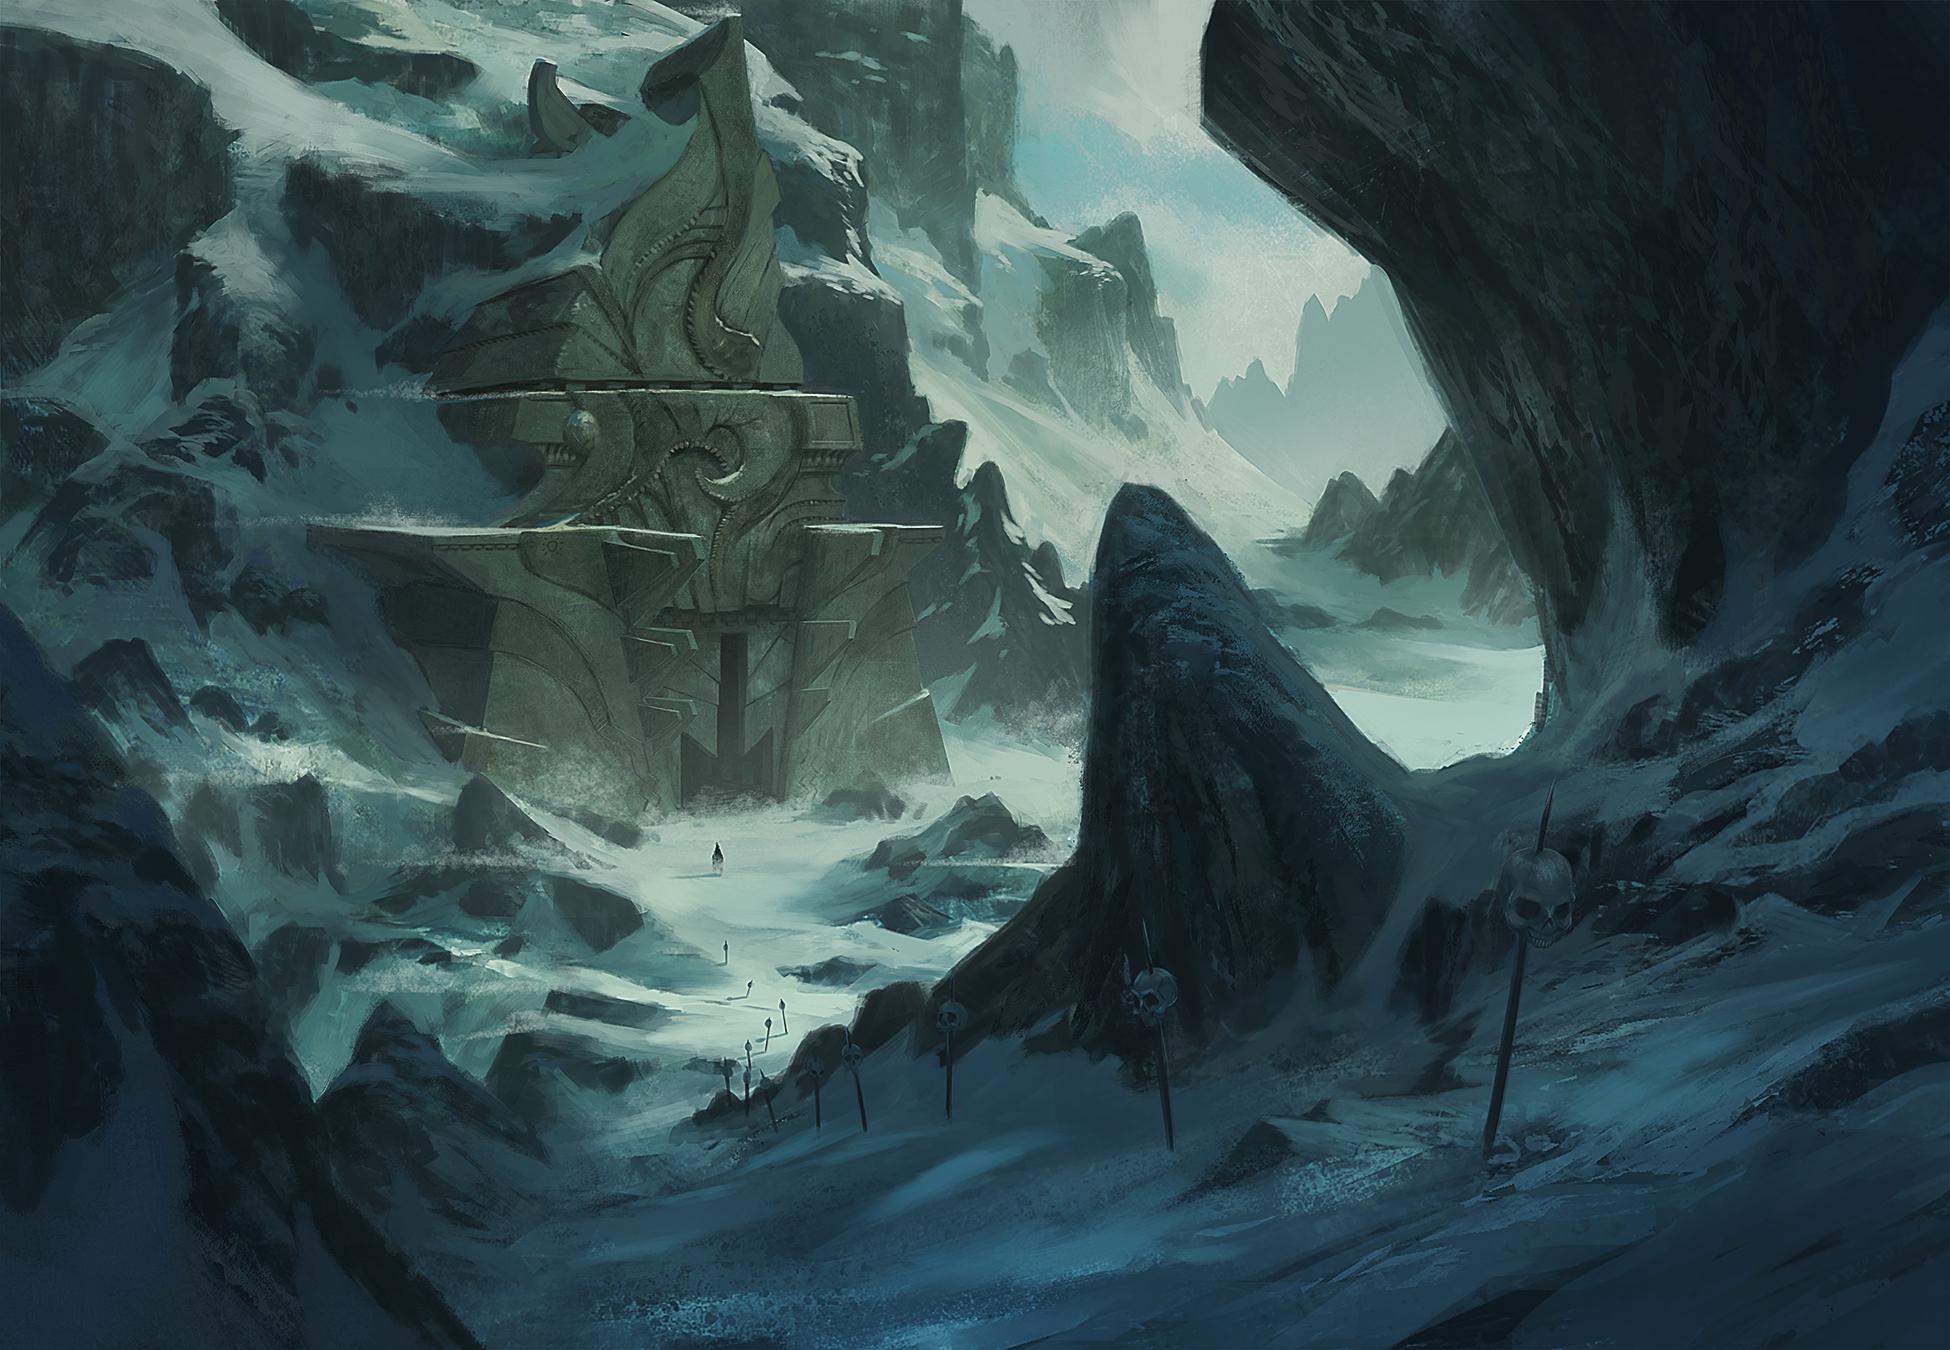 evil landscape background - photo #3